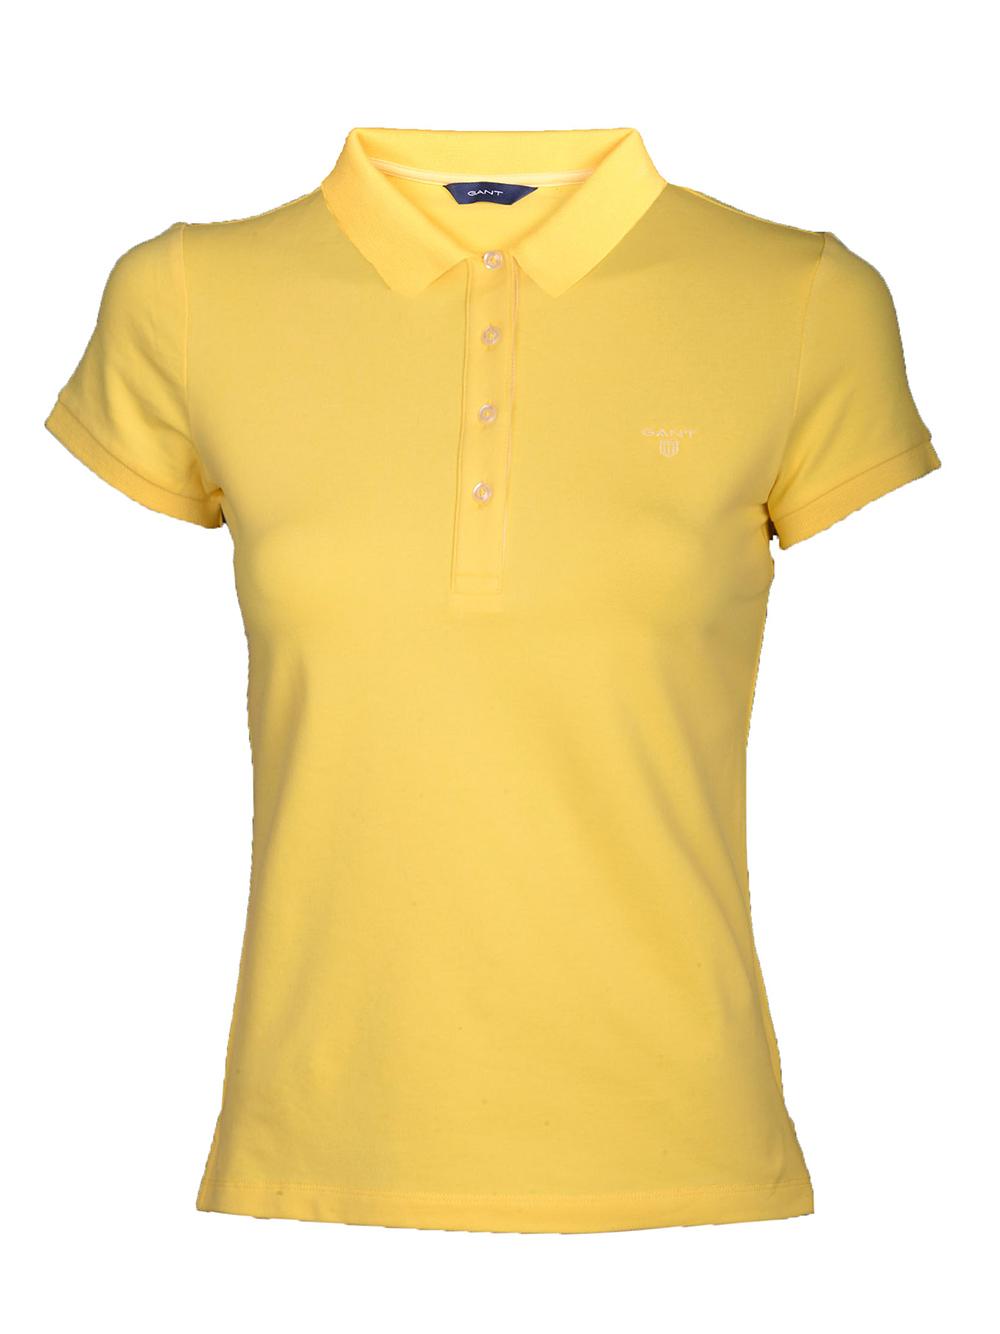 GANT Μπλούζα Polo 3GW401250 ΚΙΤΡΙΝΟ